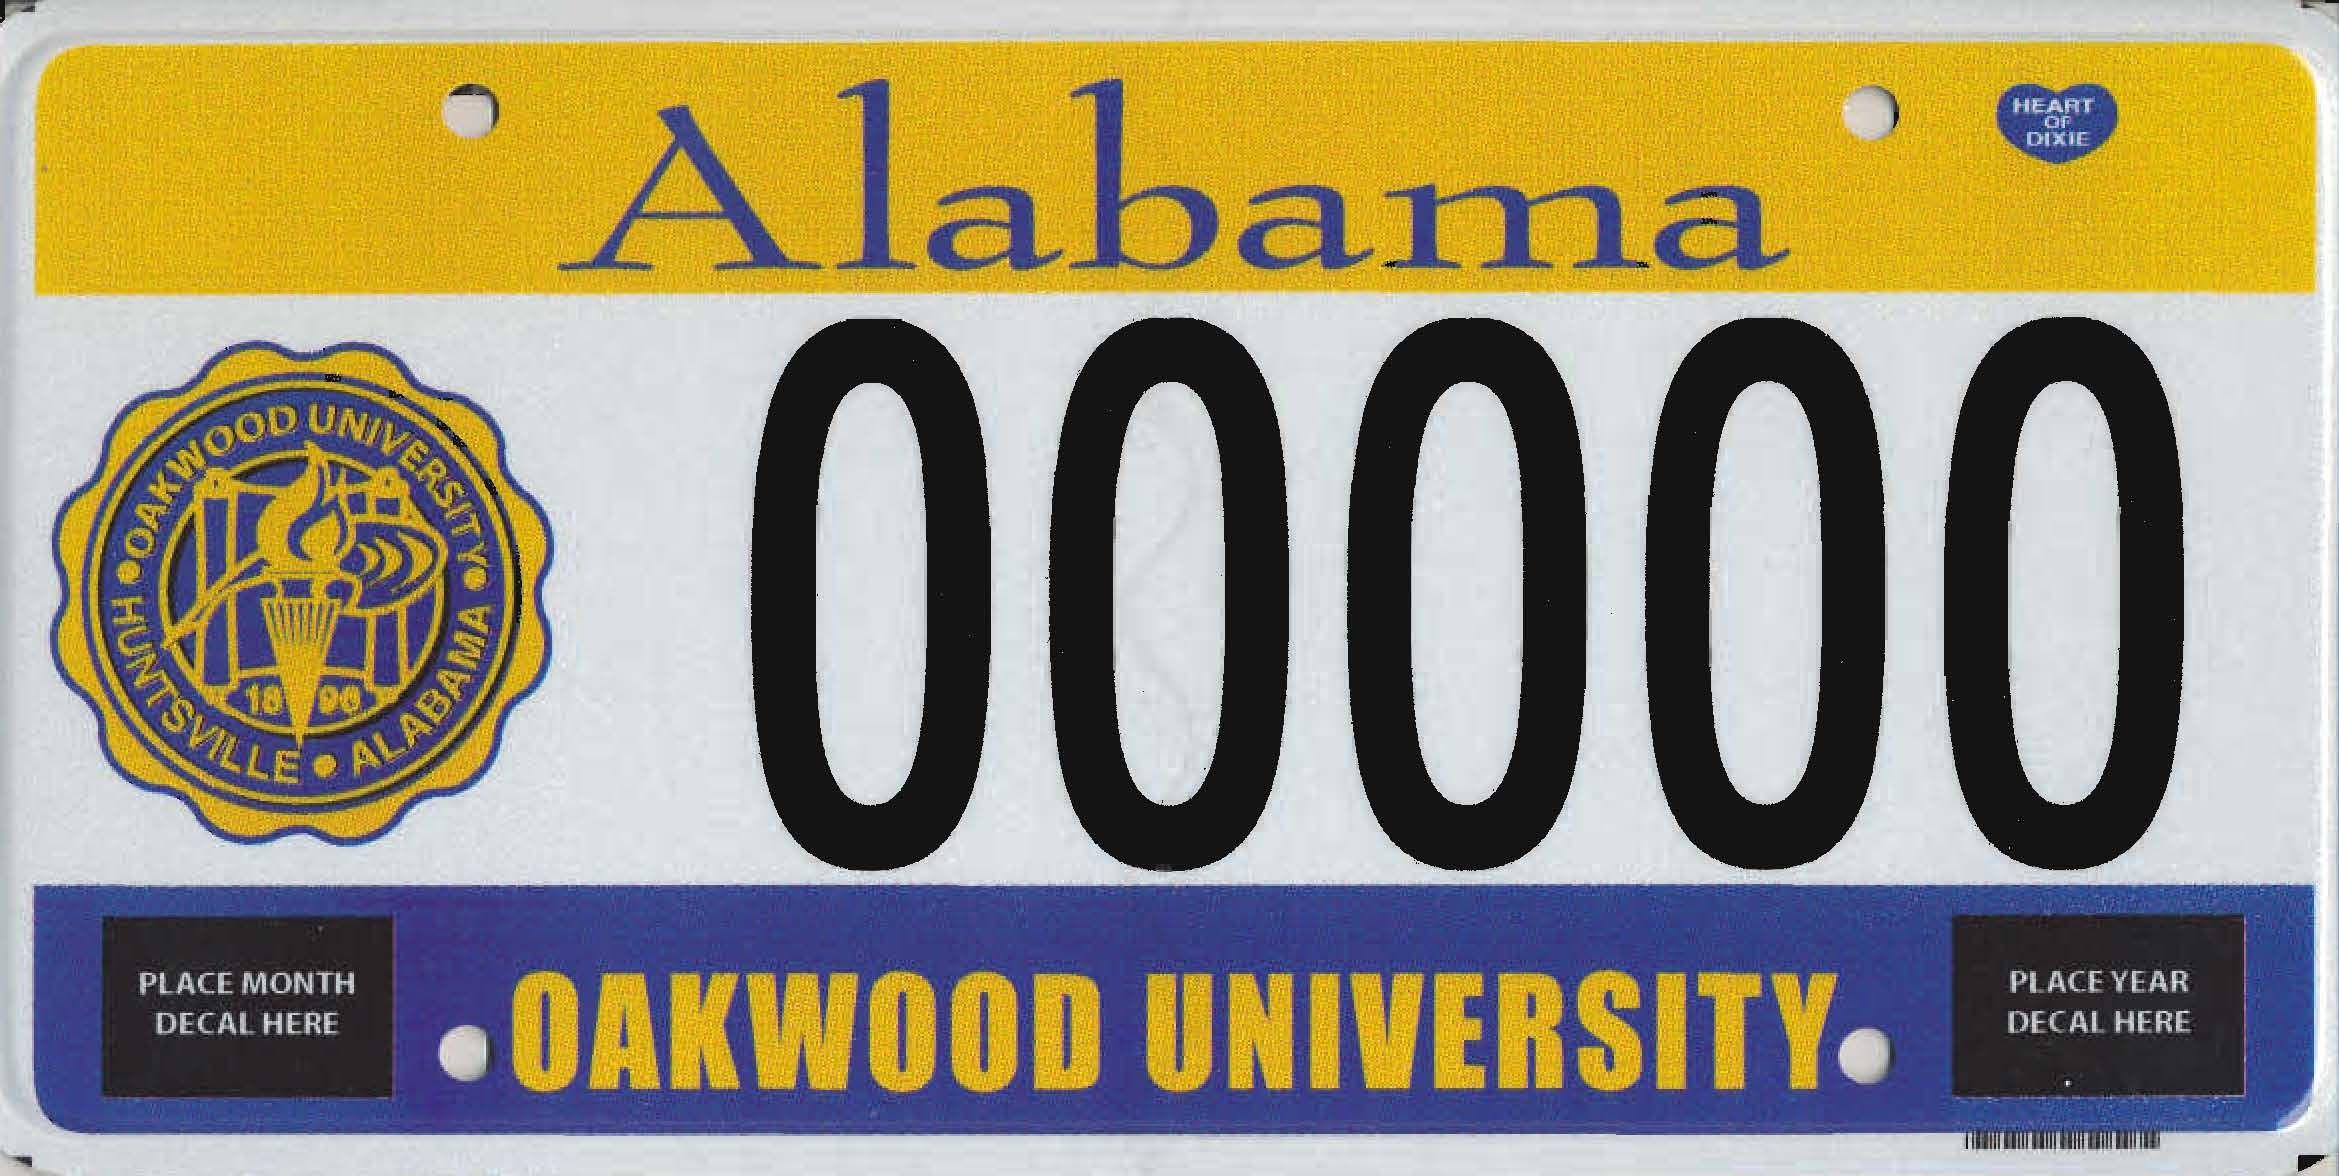 Oakwood University ranks #61 nationally in conferring